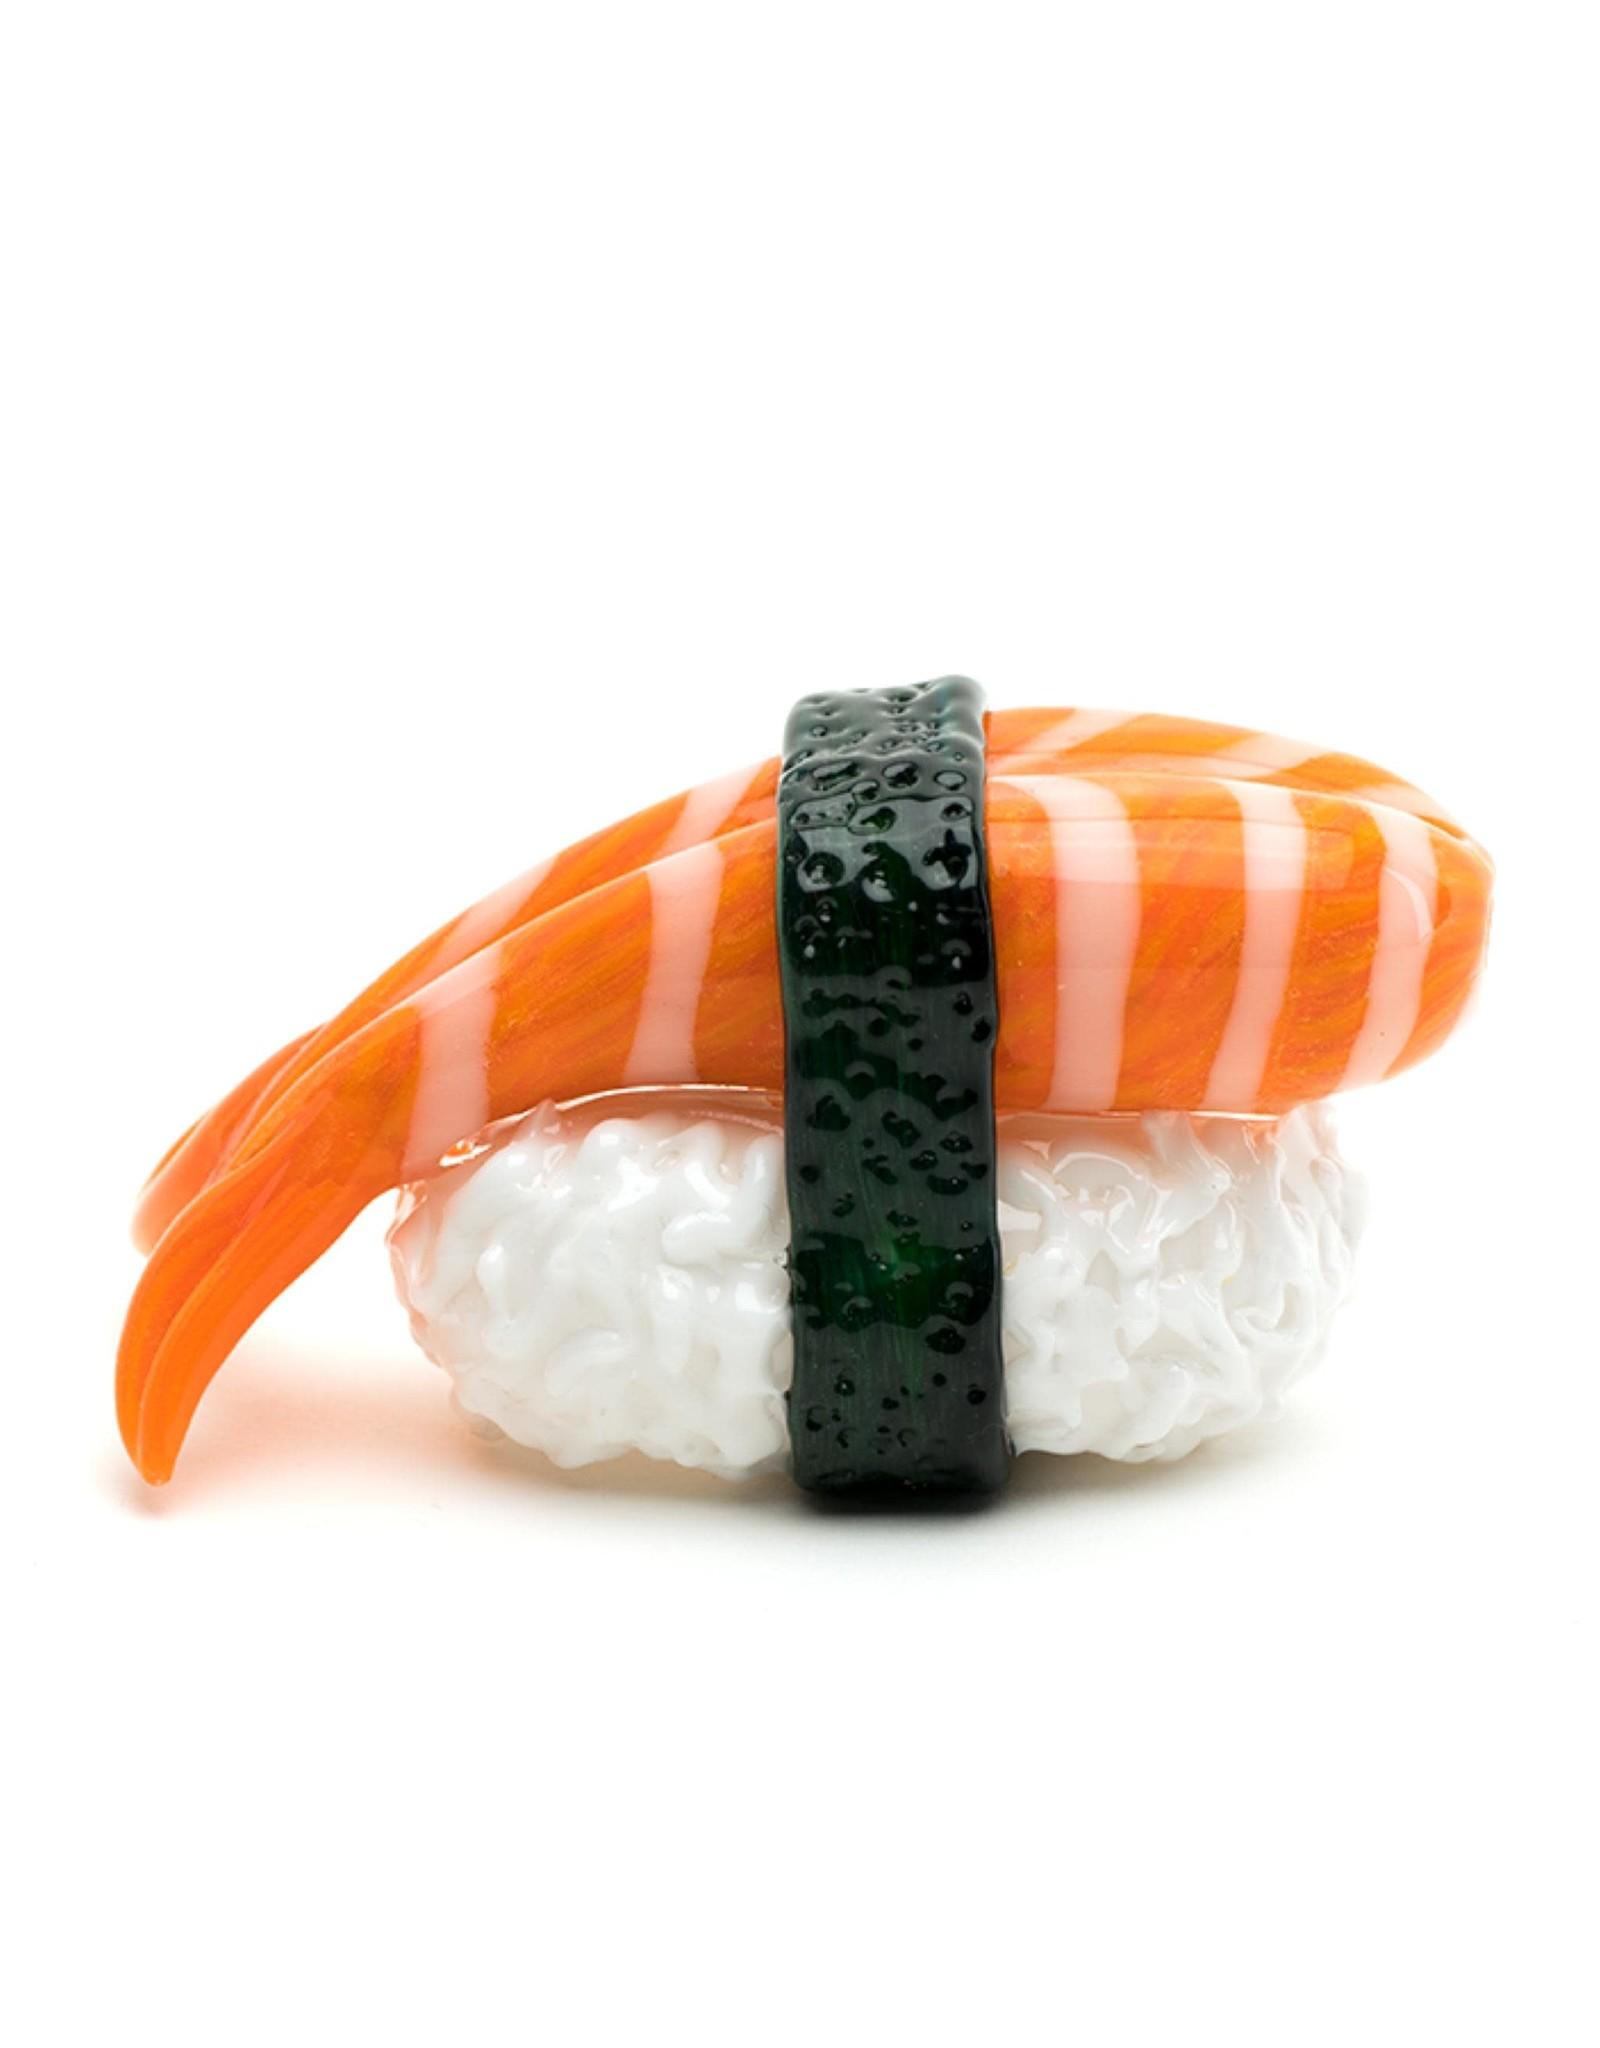 Empire Glass Shrimp Nigiri Dry Pipe